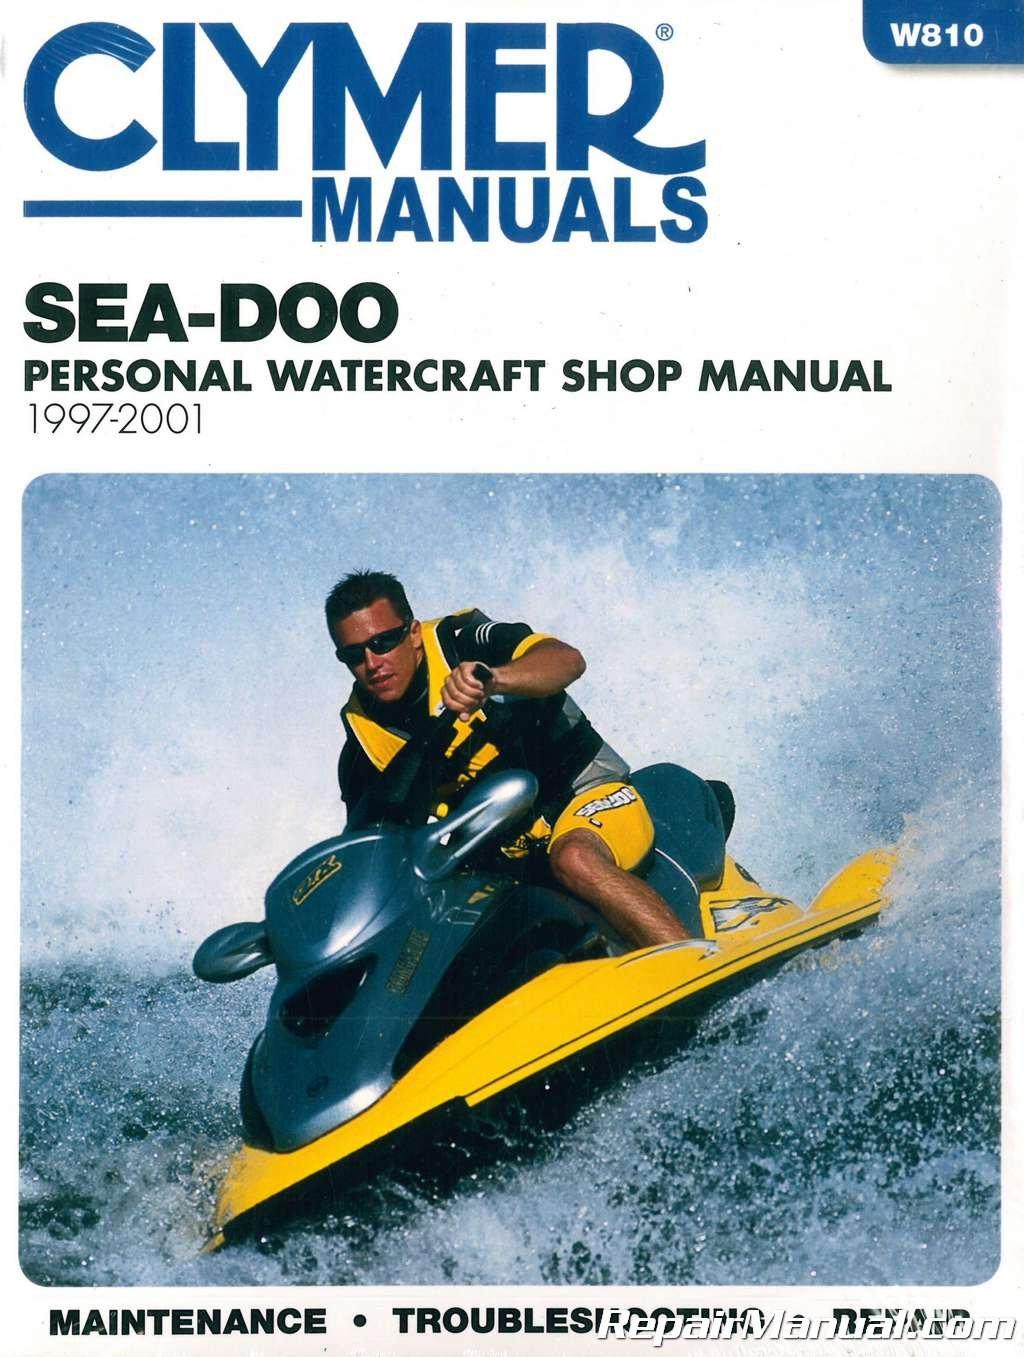 W810 Sea-Doo Water Vehicles 1997-2001 Clymer PWC Shop Manual: Manufacturer:  Amazon.com: Books